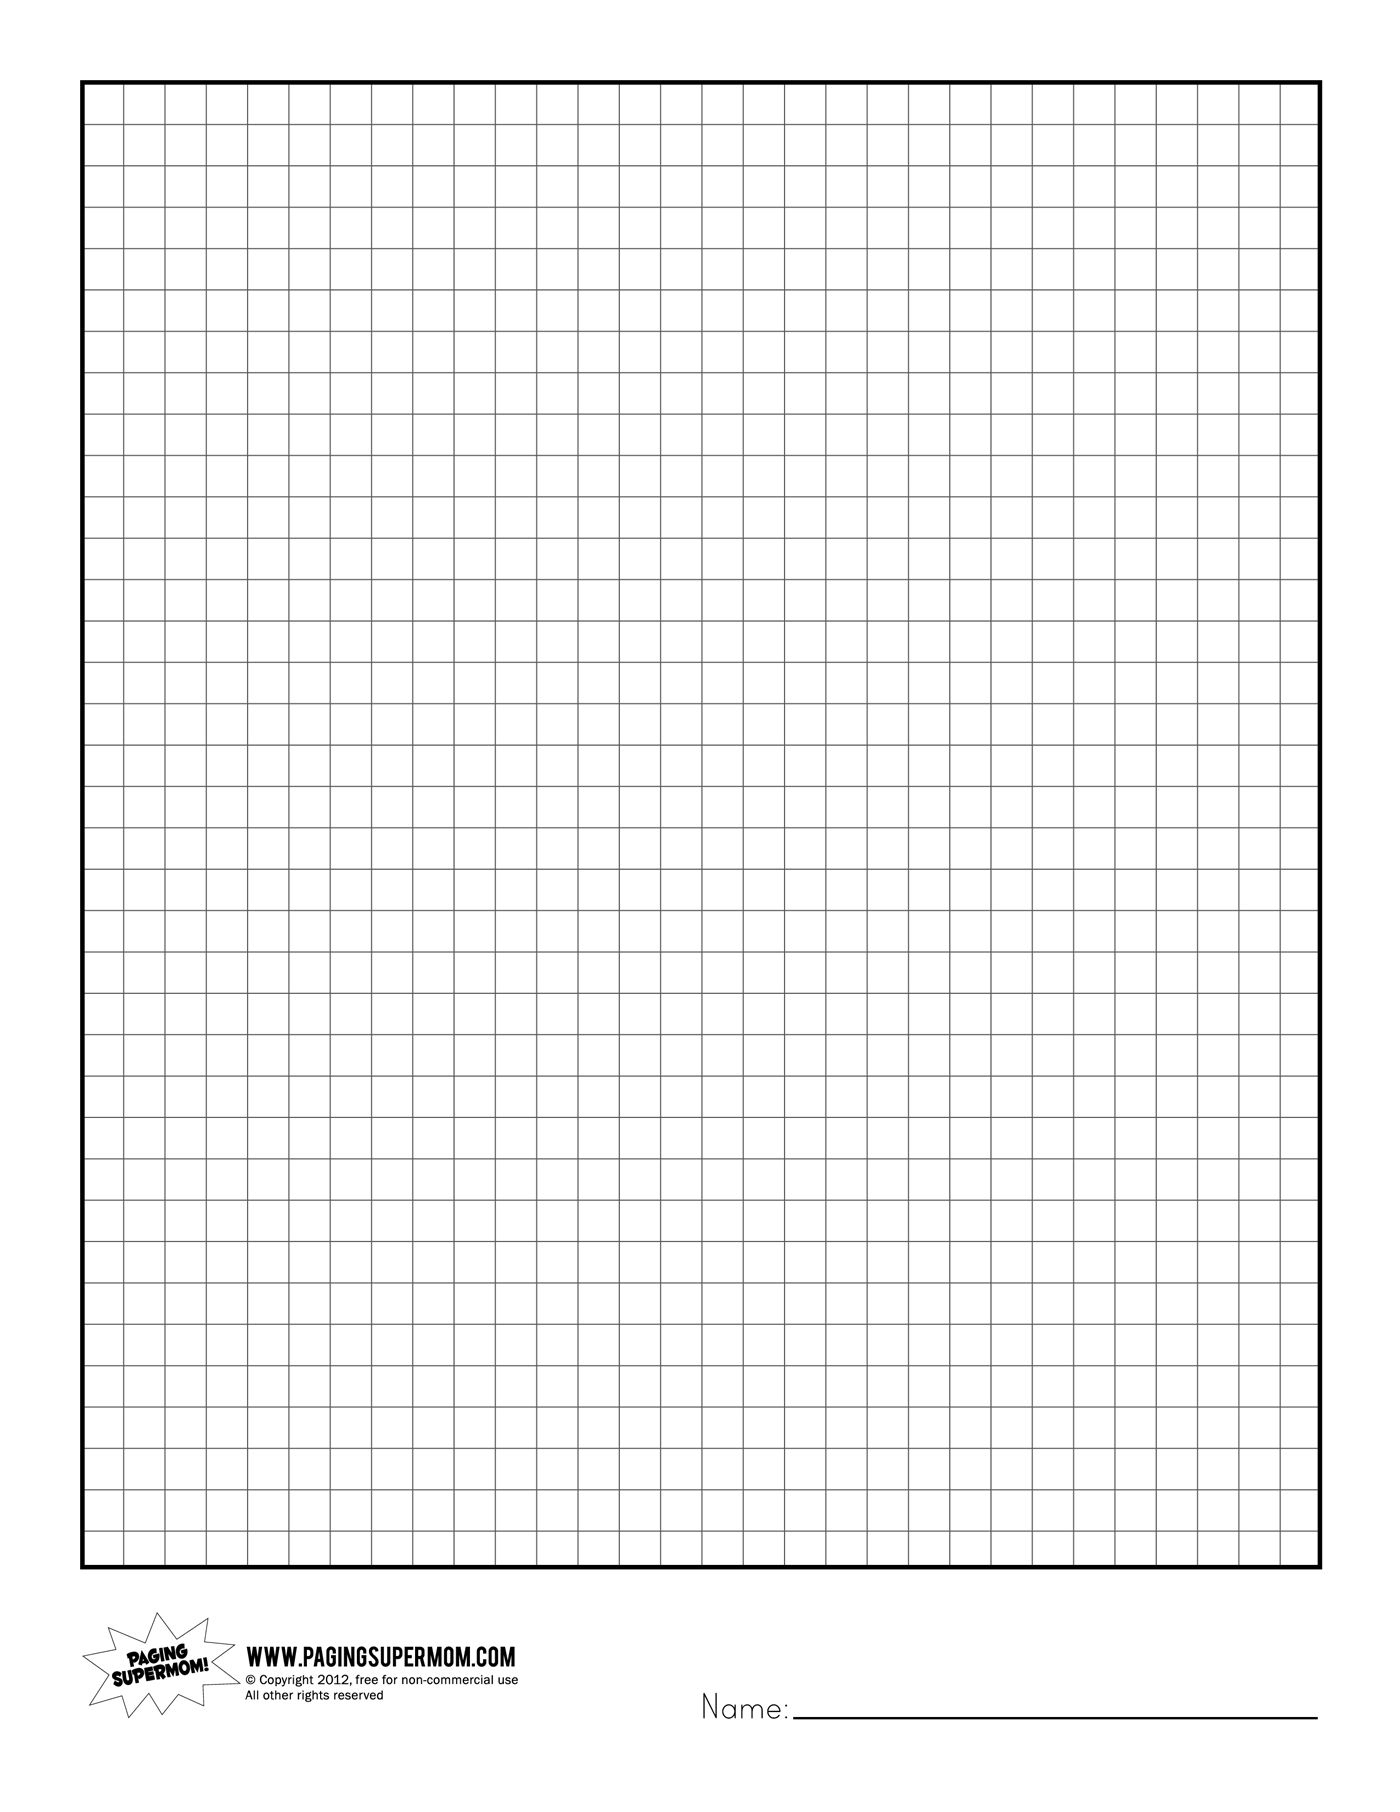 Printable Graph Paper | Healthy Eating | Printable Graph Paper - Free Printable Graph Paper No Download